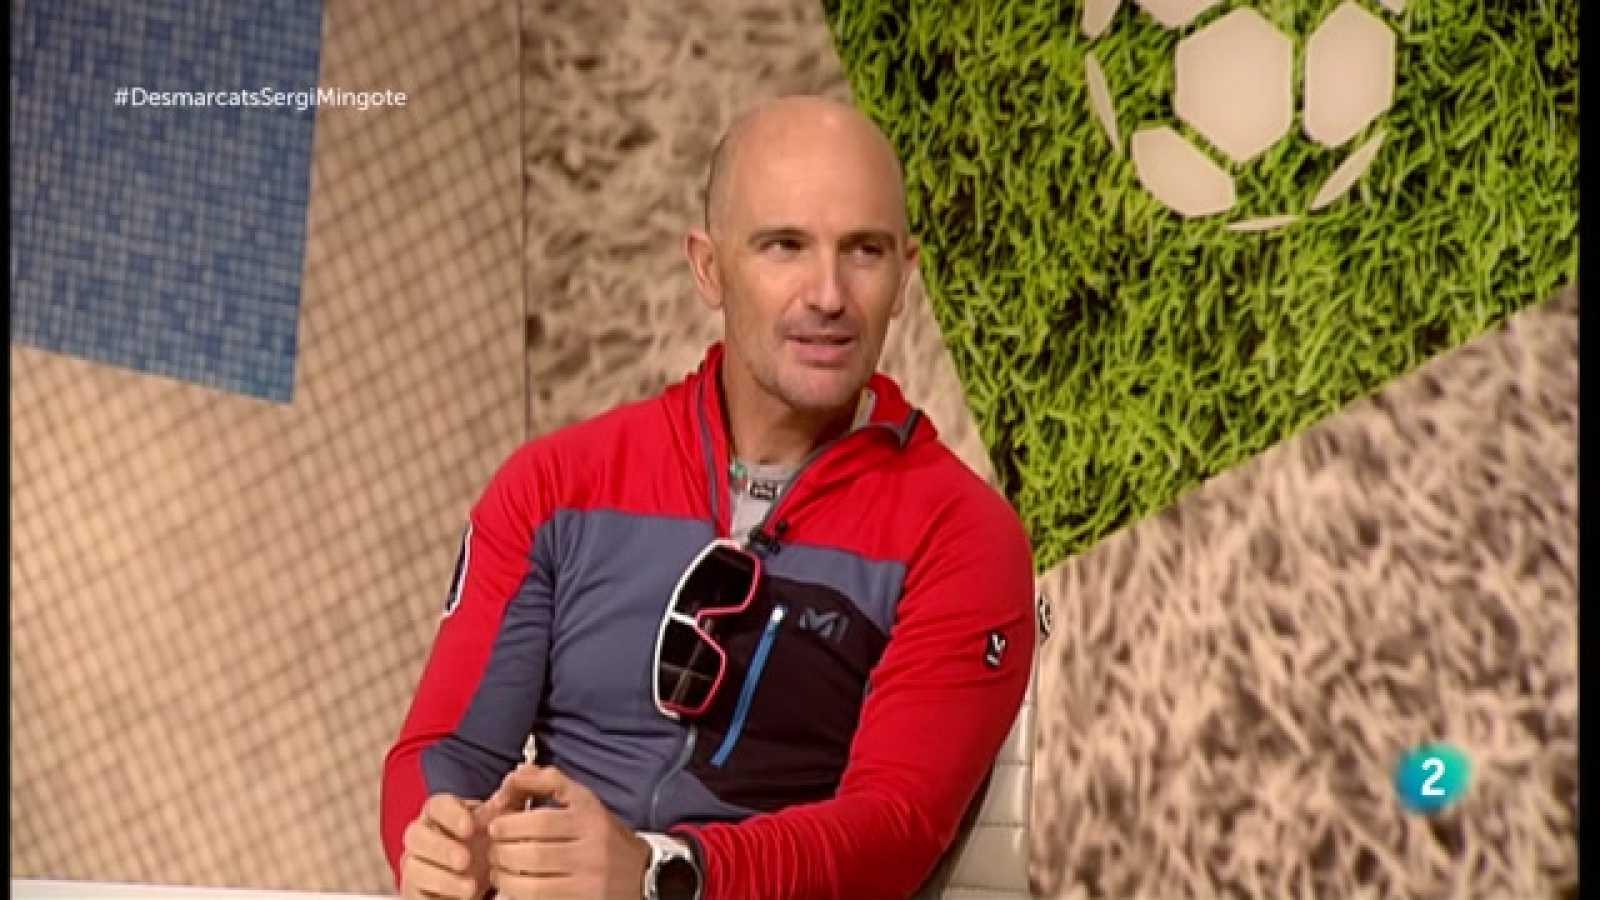 Desmarcats. Sergi Mingote, alpinista